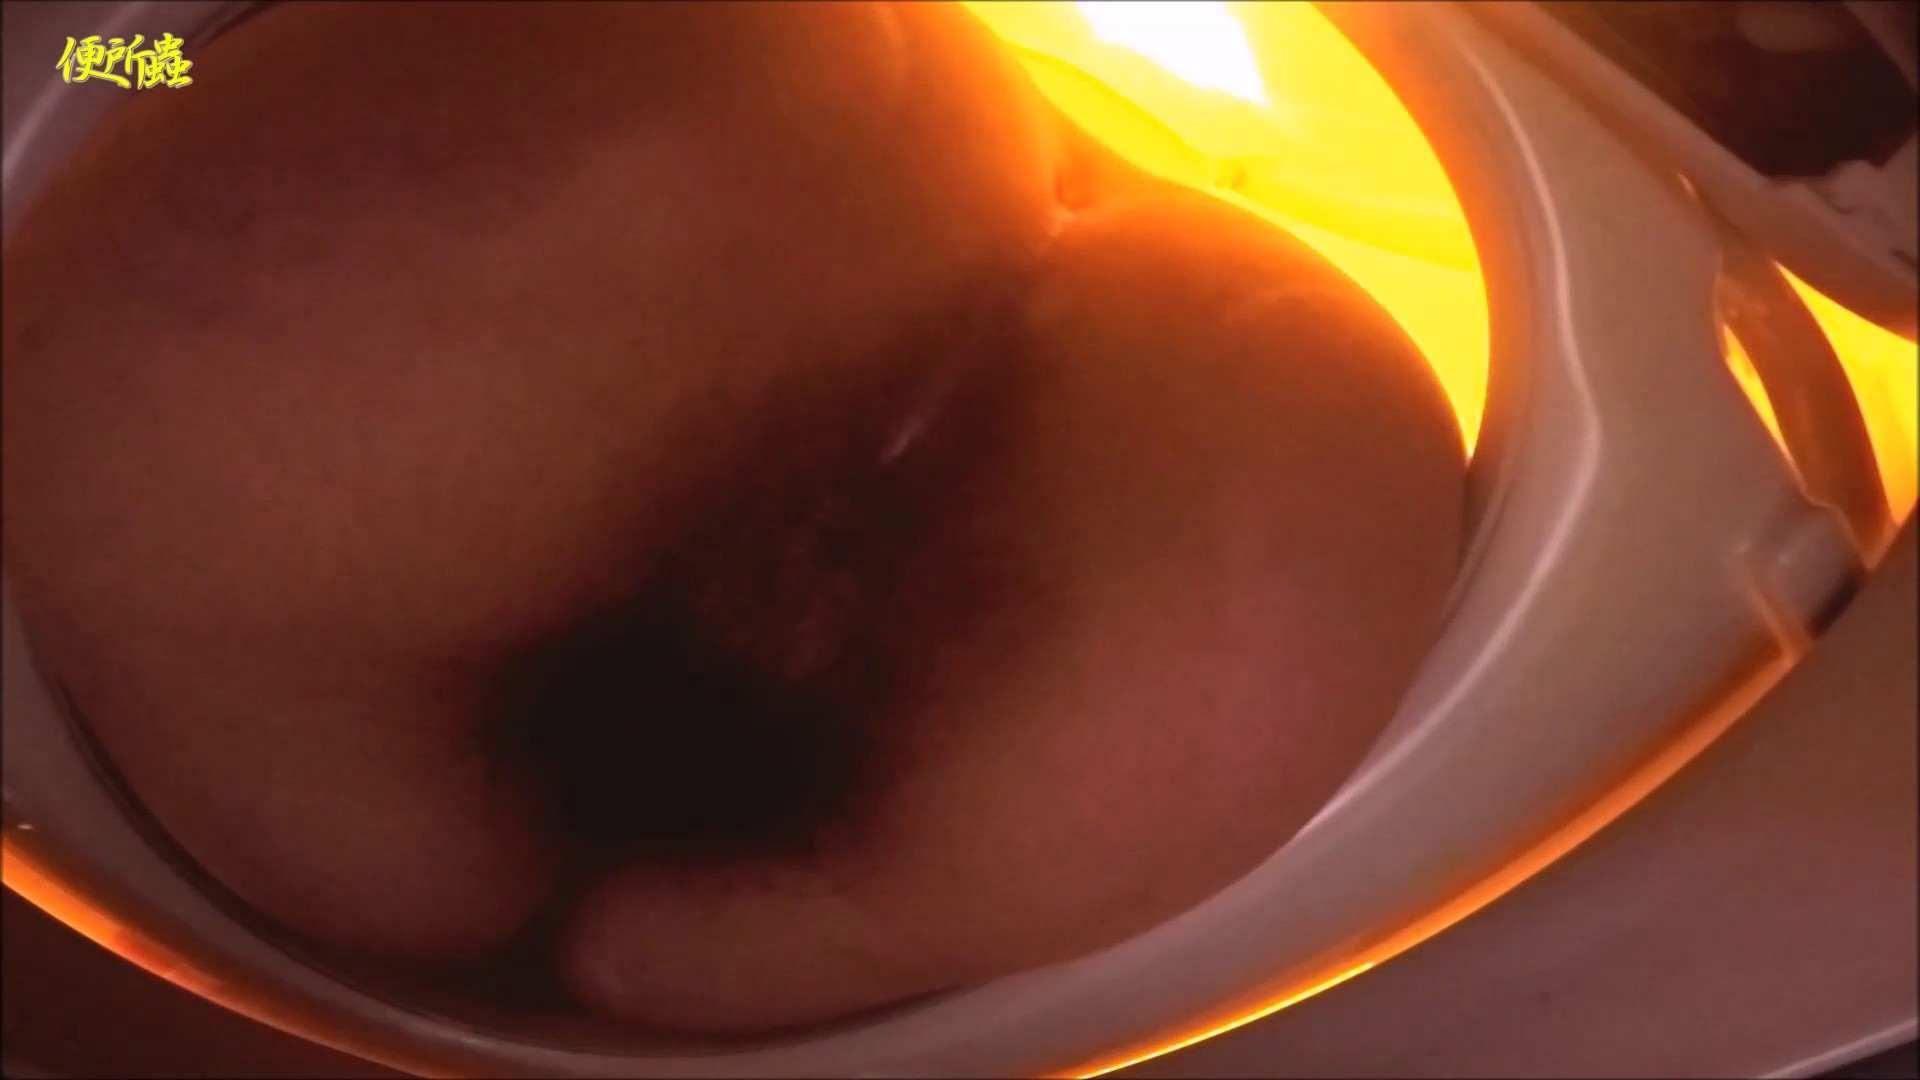 vol.08 便所蟲さんのリターン~寺子屋洗面所盗撮~ 盗撮  94PIX 4